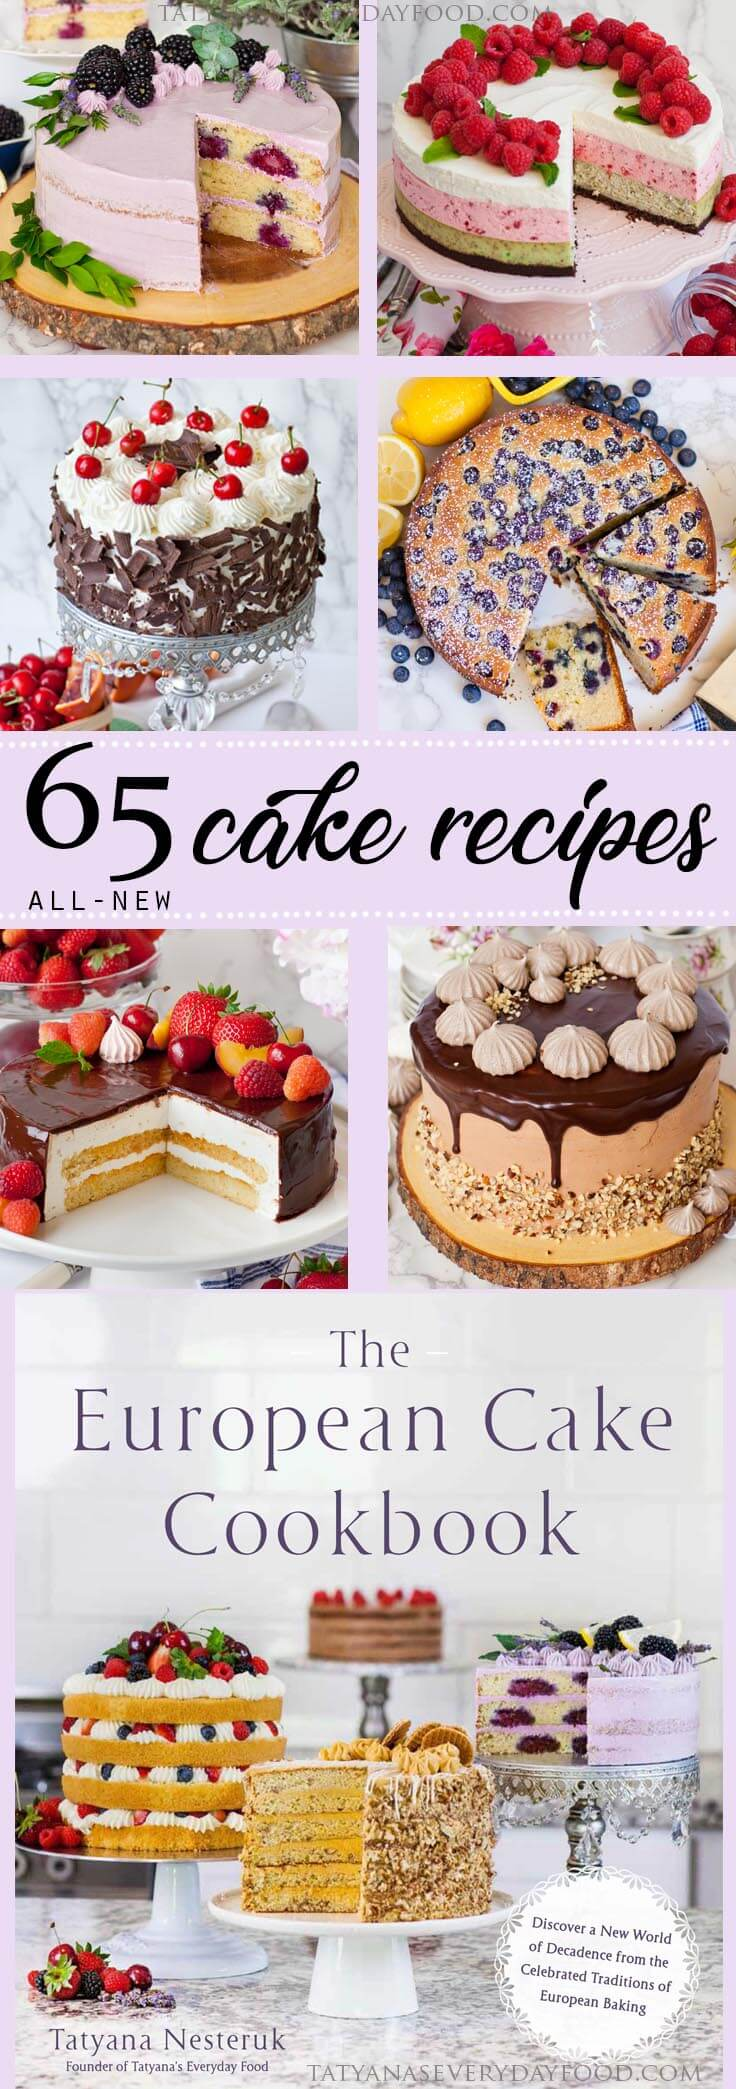 Tatyana S Everyday Food Cakes